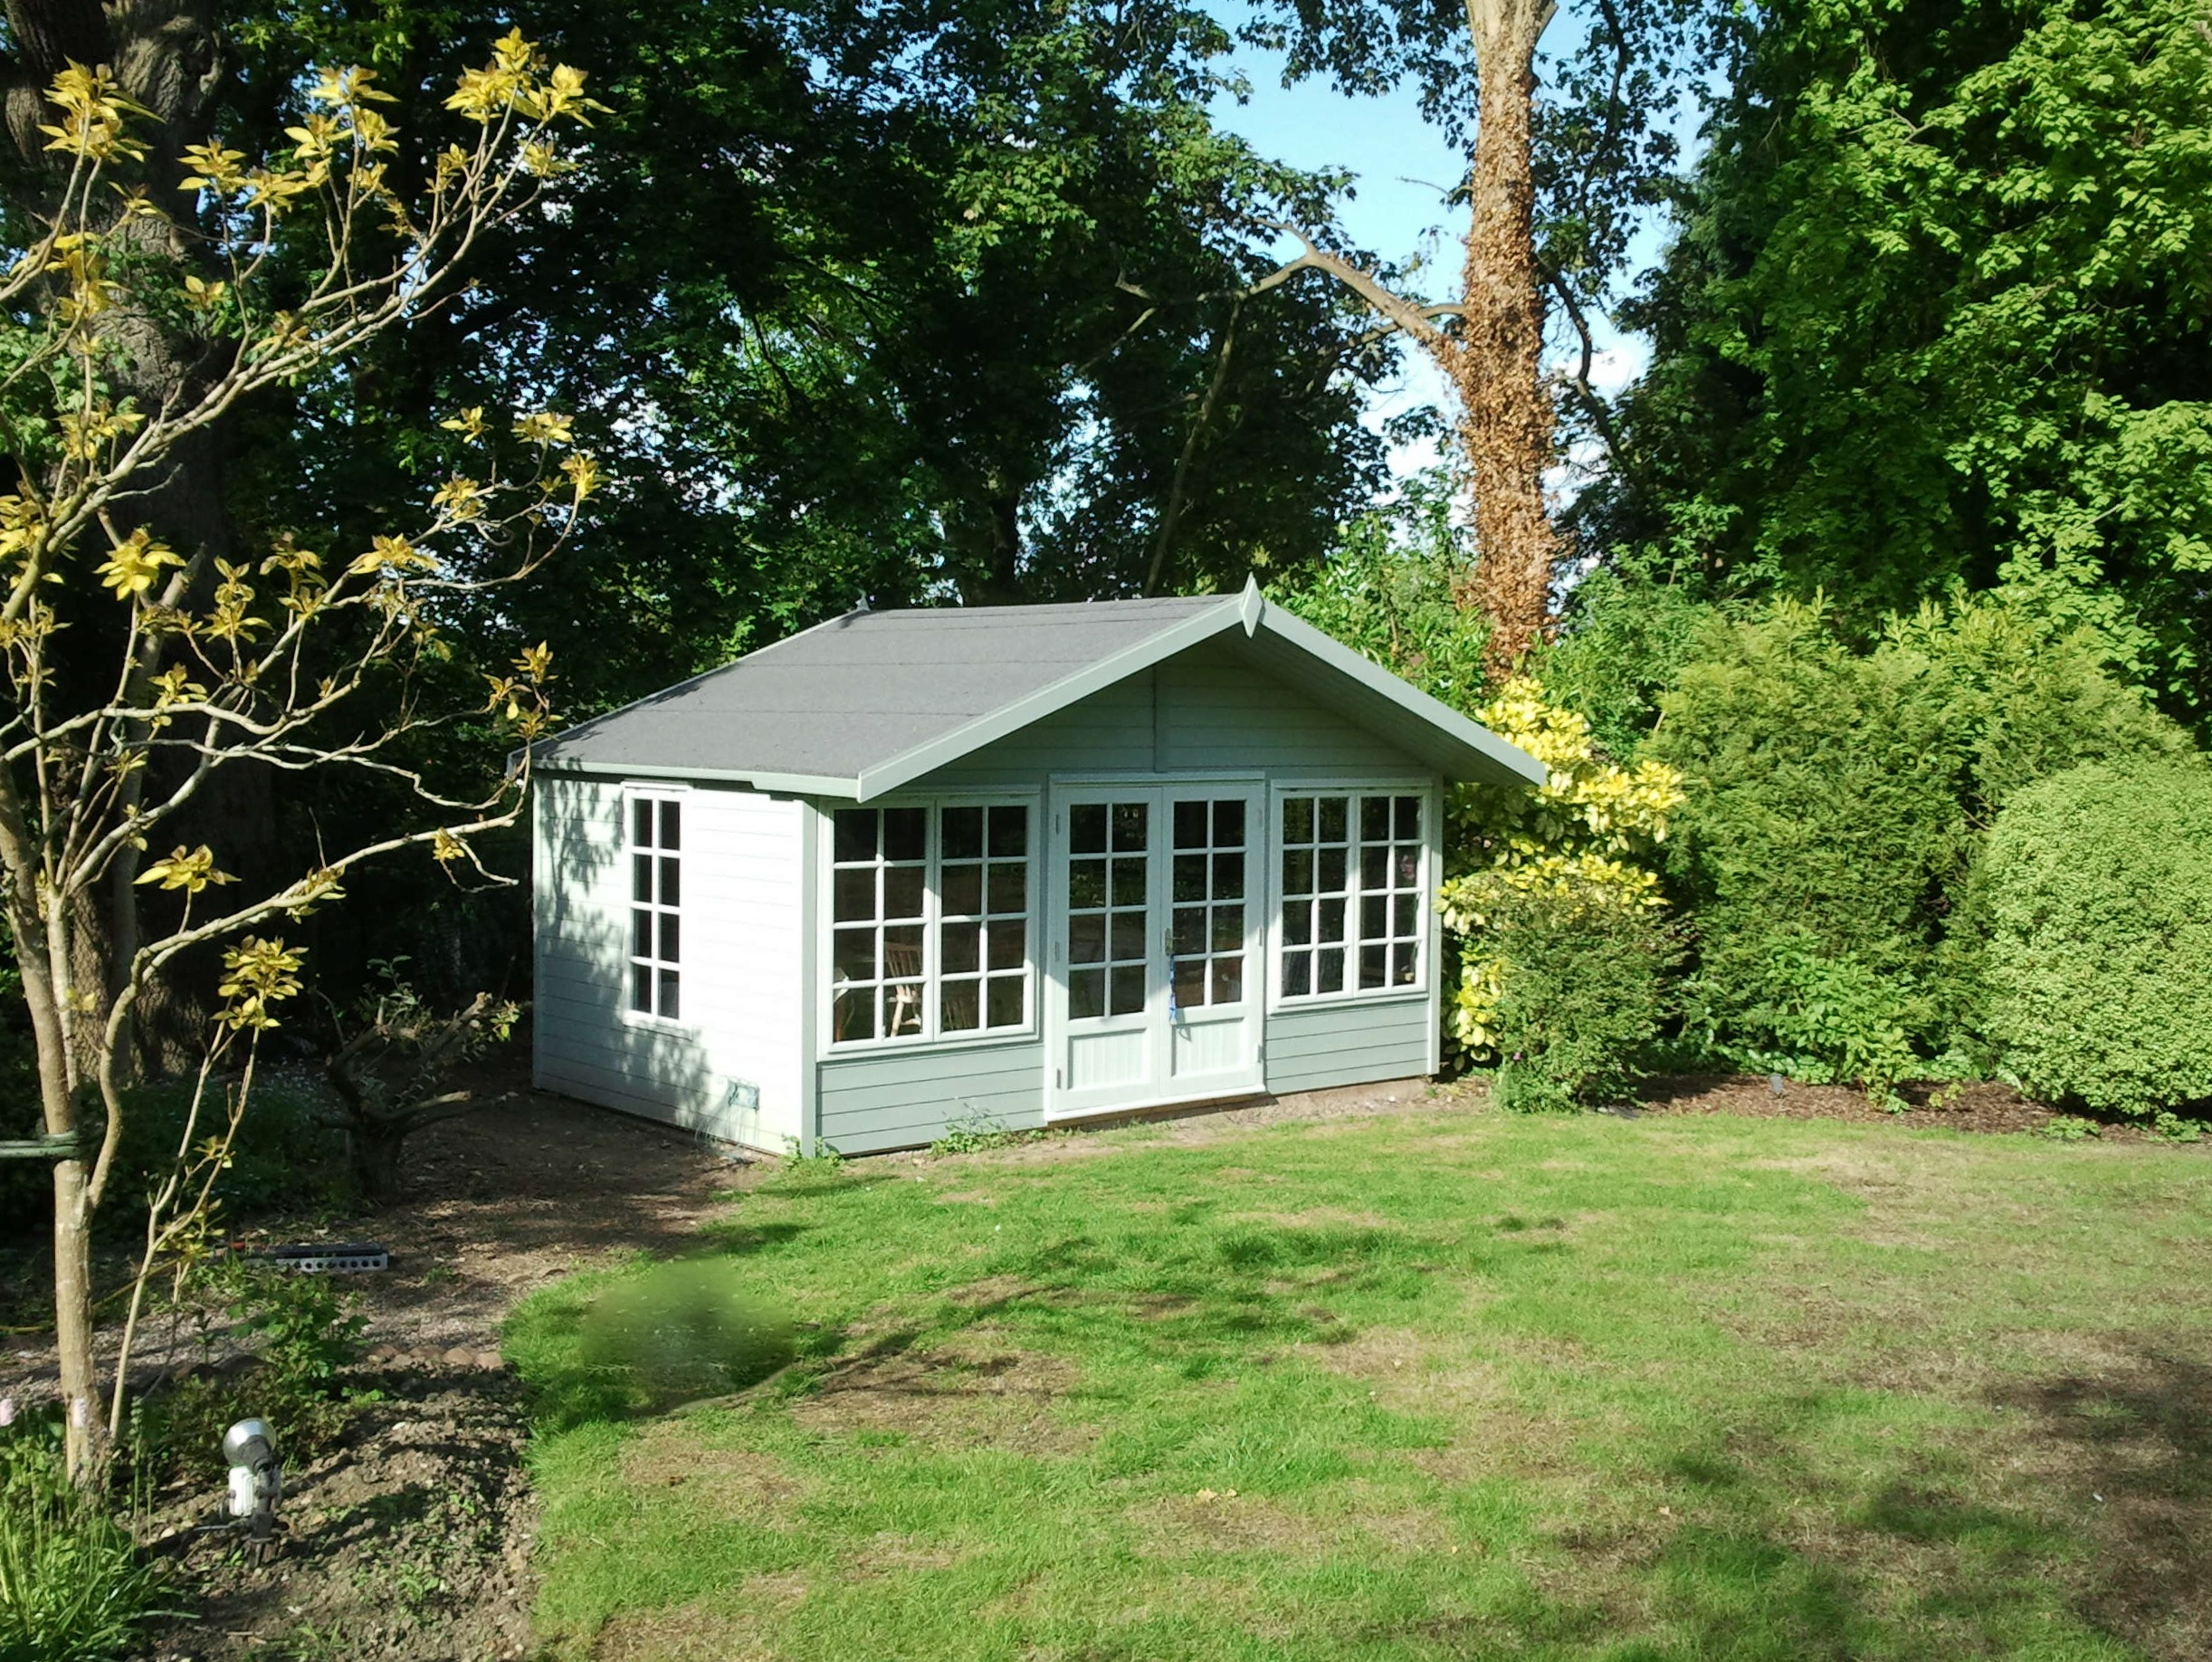 Log Cabin Buildings For Sale